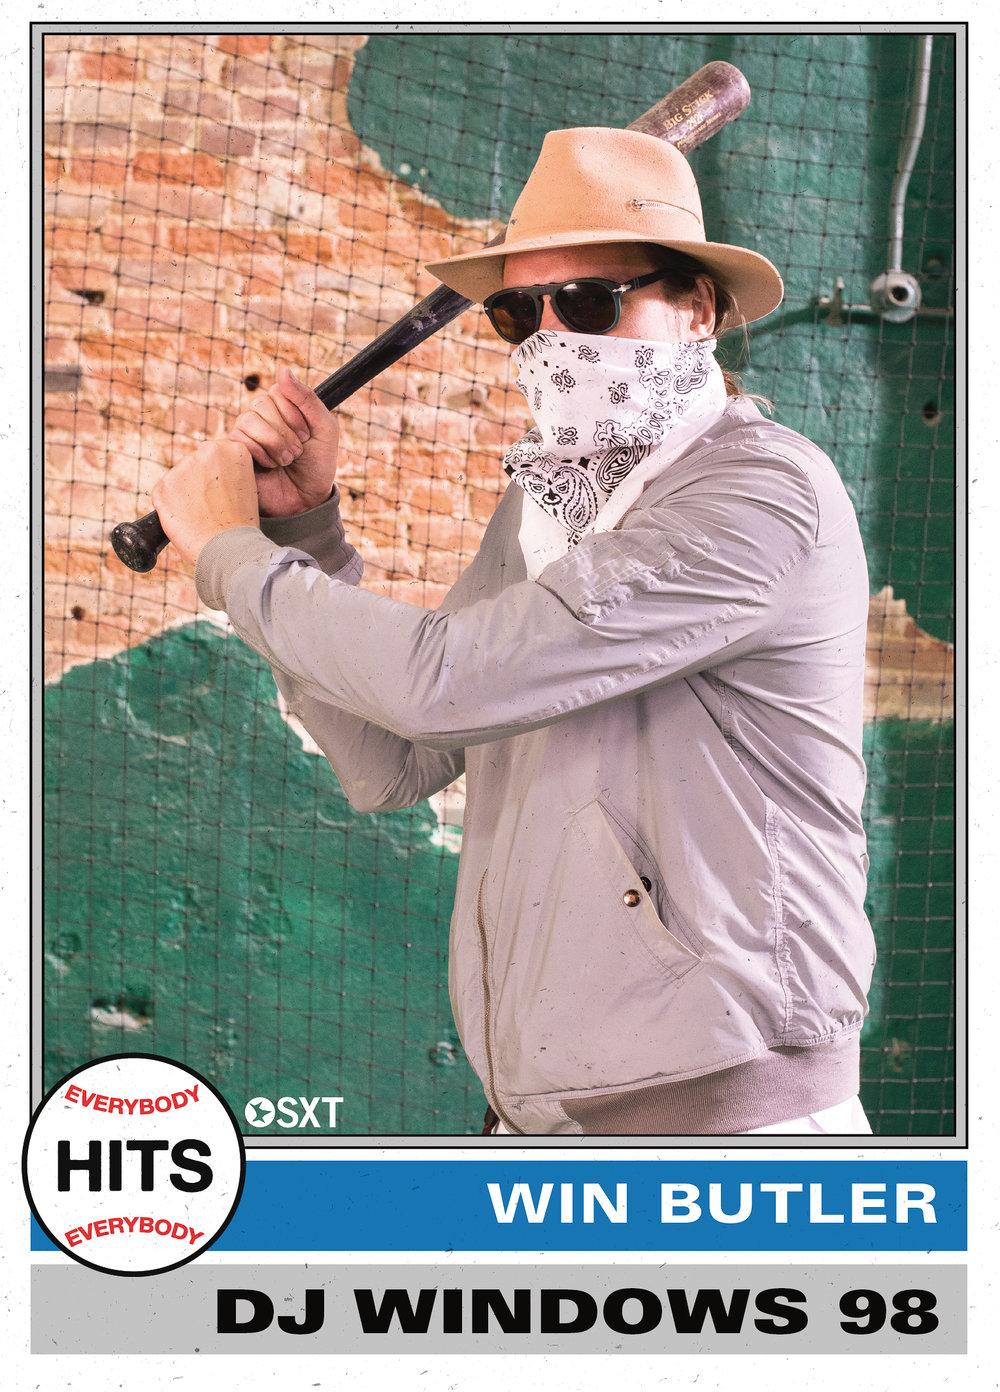 Win Butler